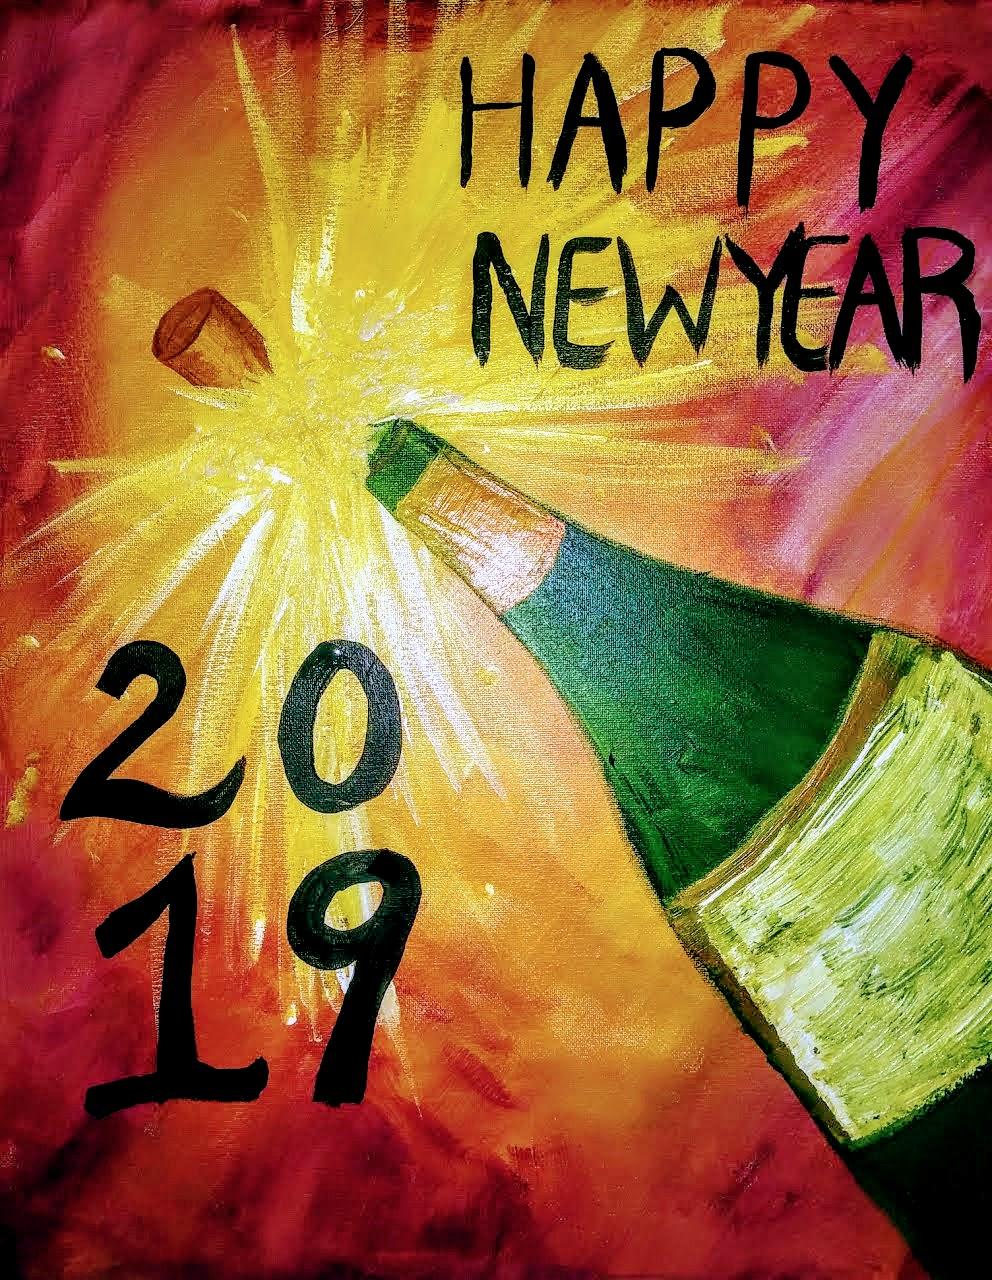 Happy New Year 2019 - Jackson